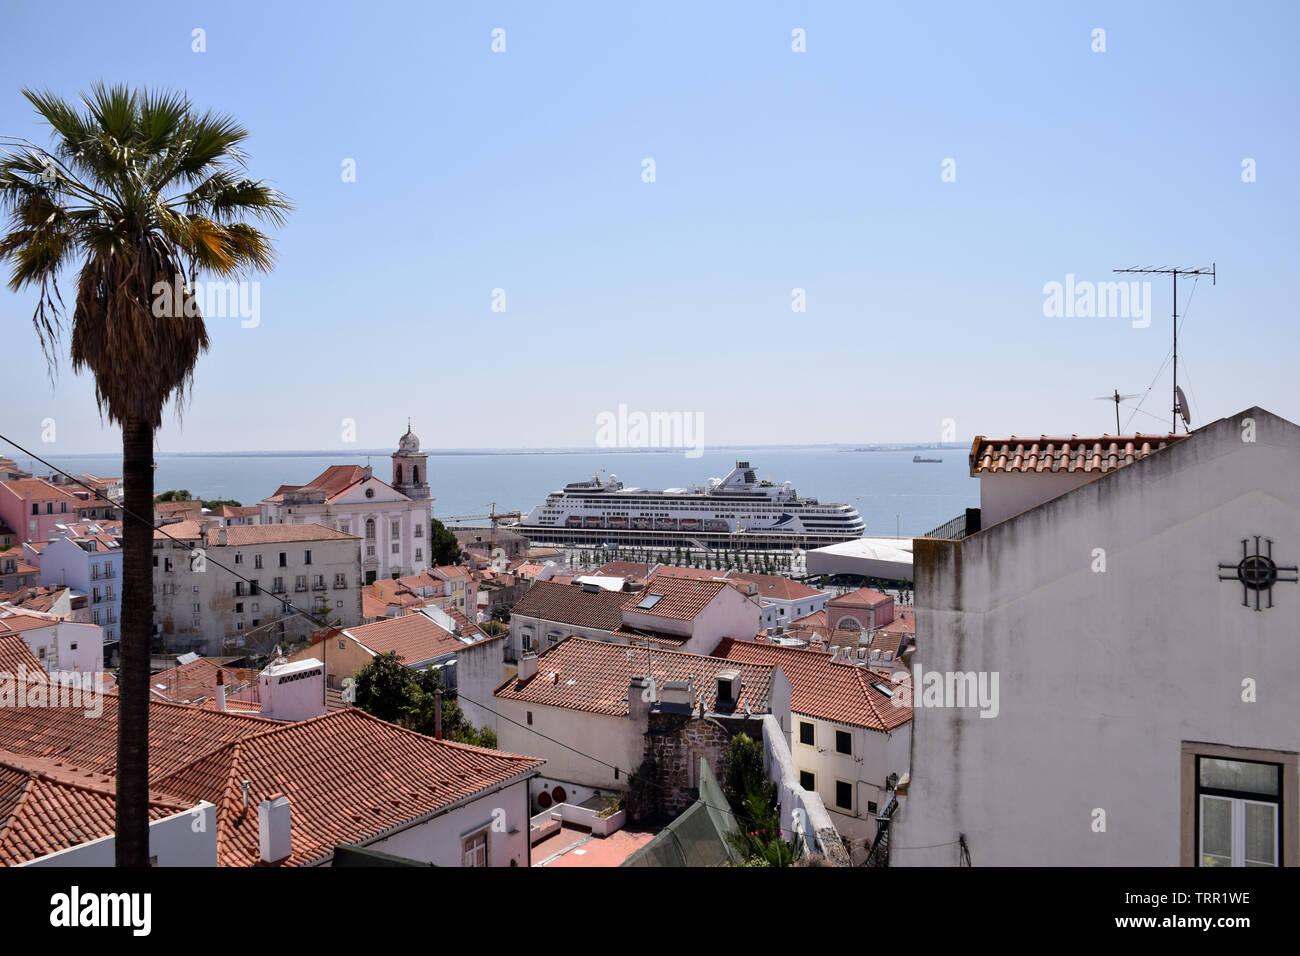 Vasco da Gama ship in the cruise terminal, Lisbon, Portugal, June 2019 - Stock Image